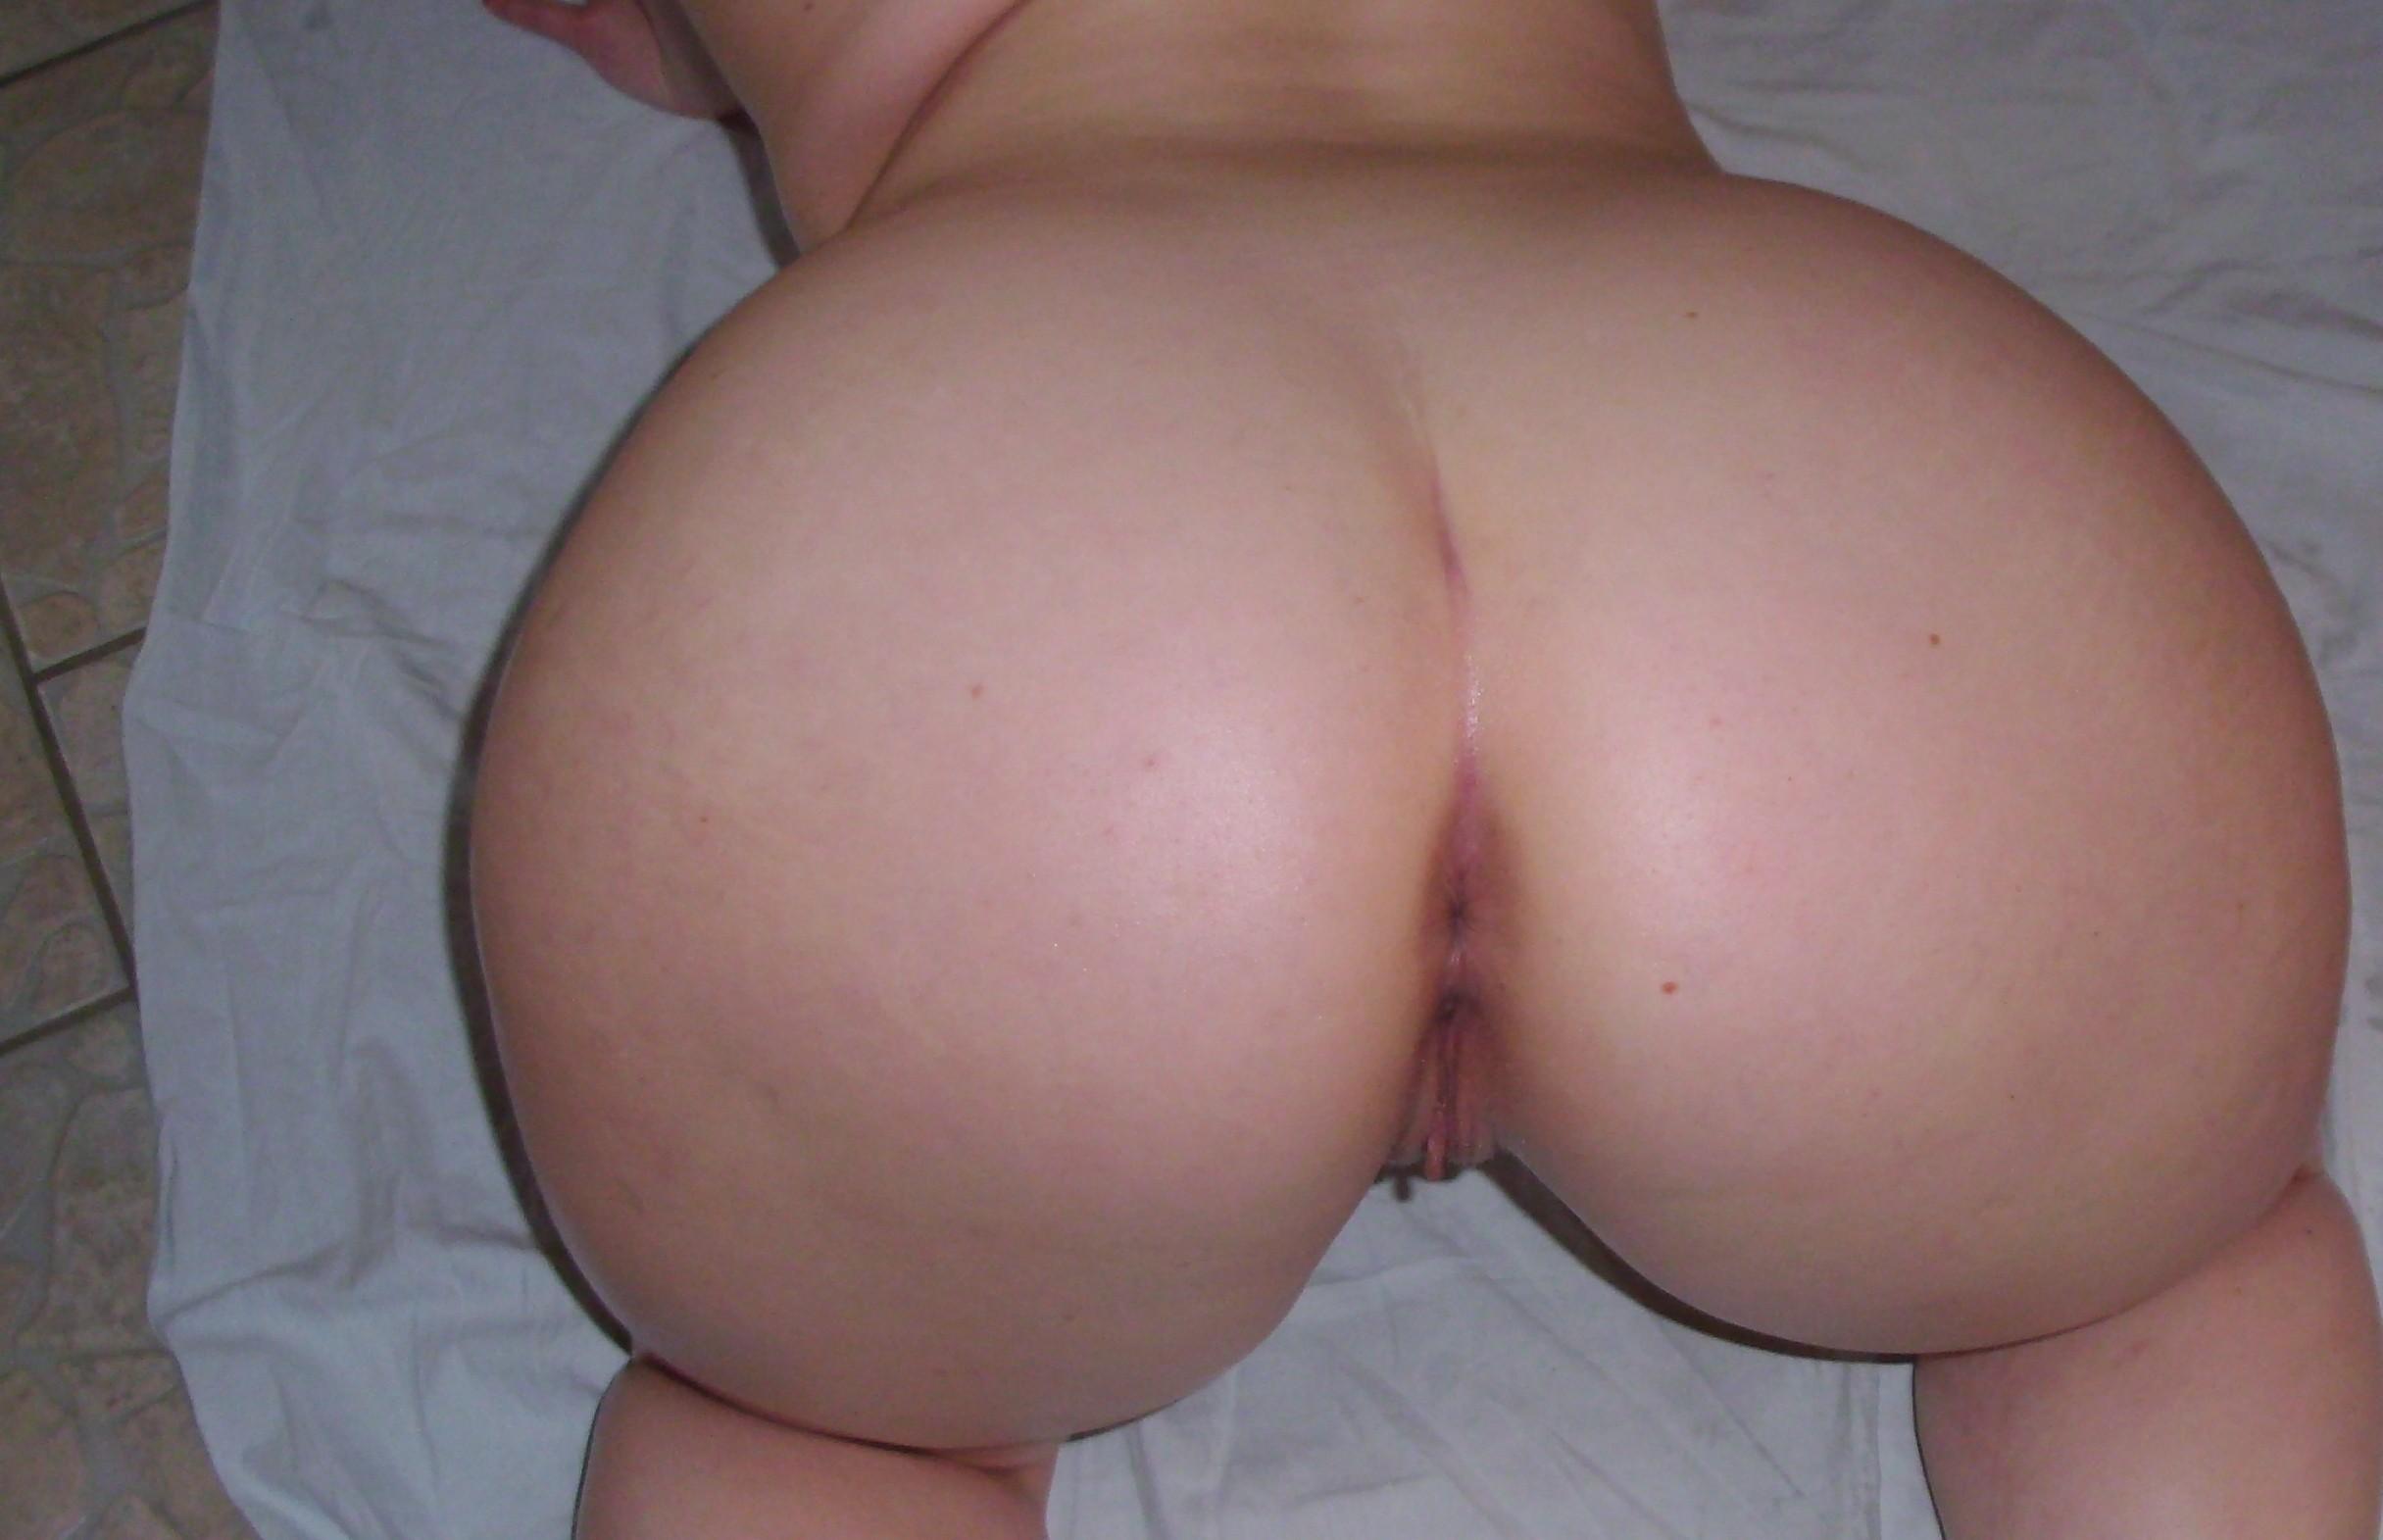 Ass Chubby Porn chubby ass porn pic - eporner